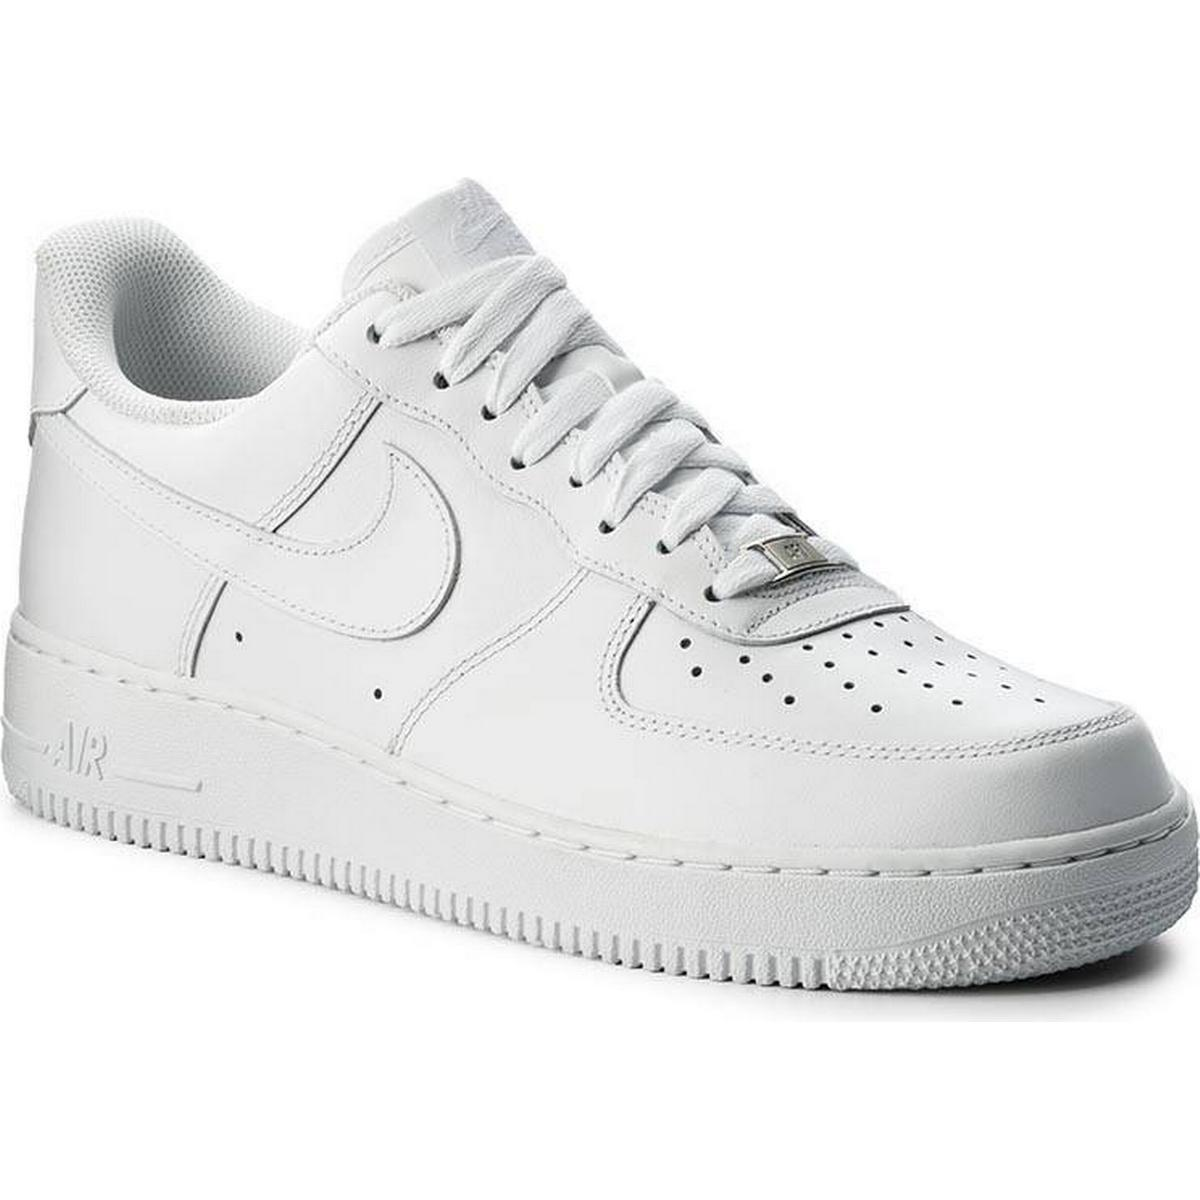 Nike air force 1 sage low dam • Hitta lägsta pris hos